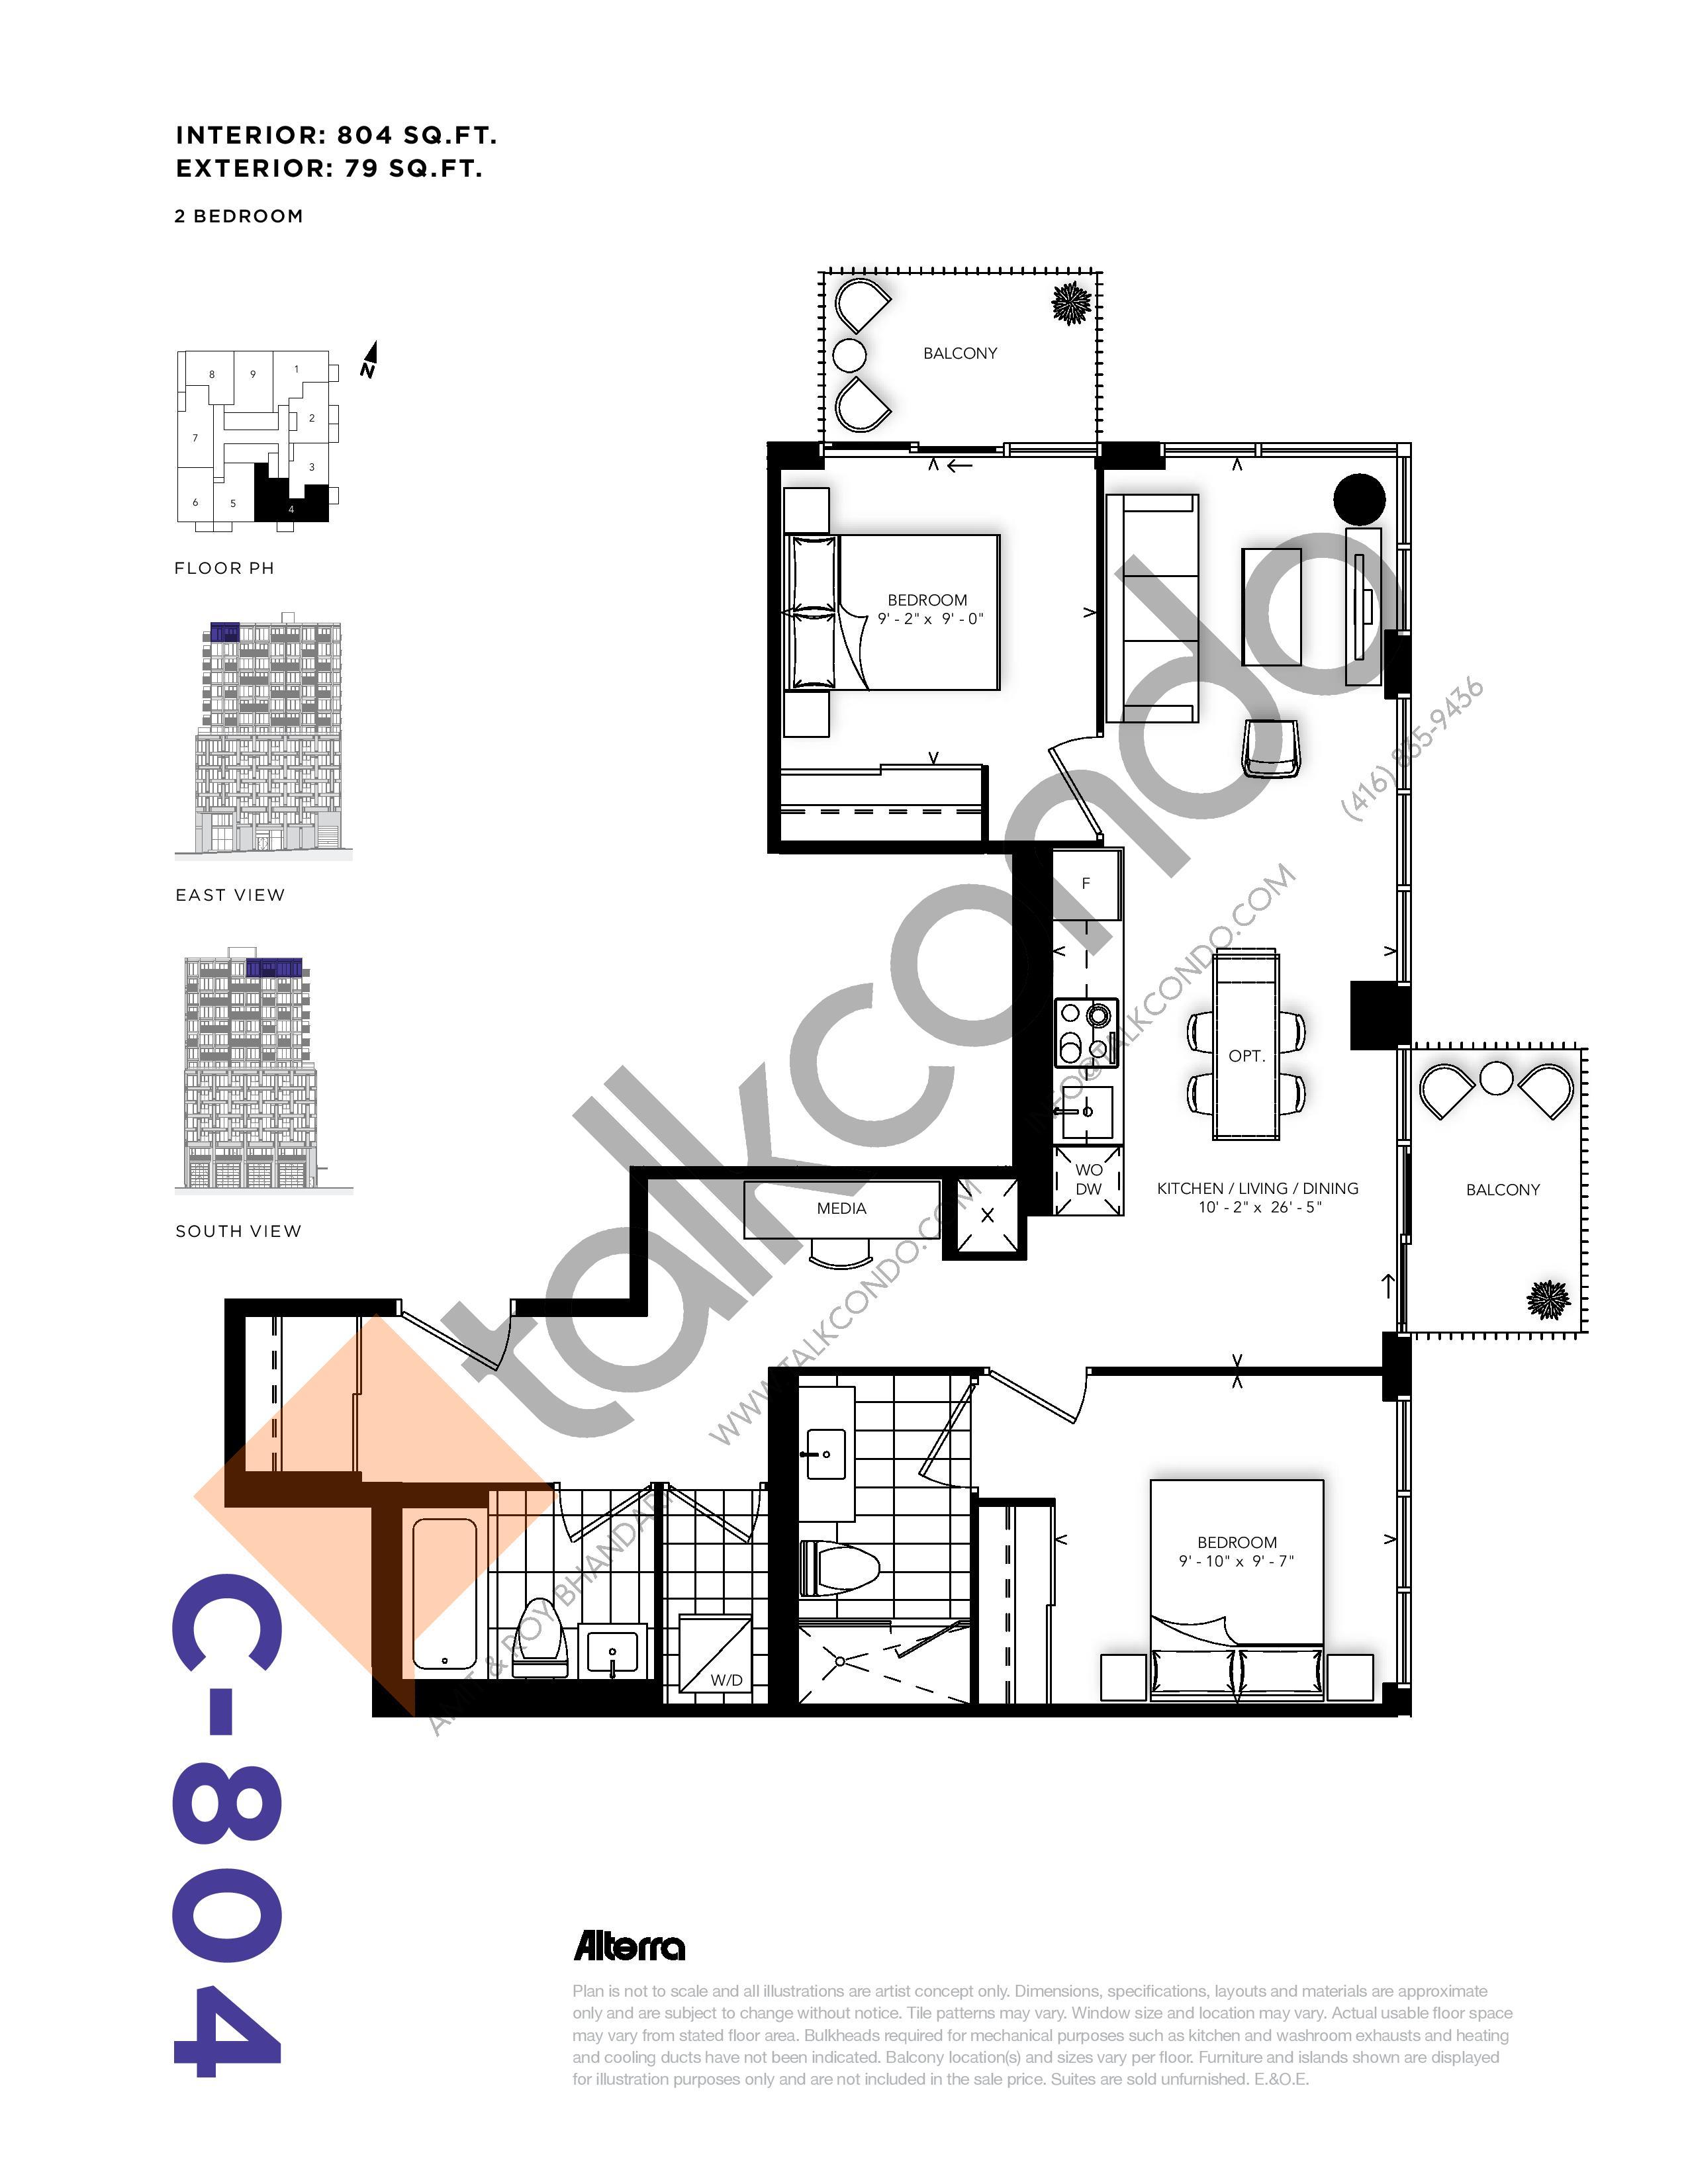 C-804 Floor Plan at RUSH Condos - 804 sq.ft